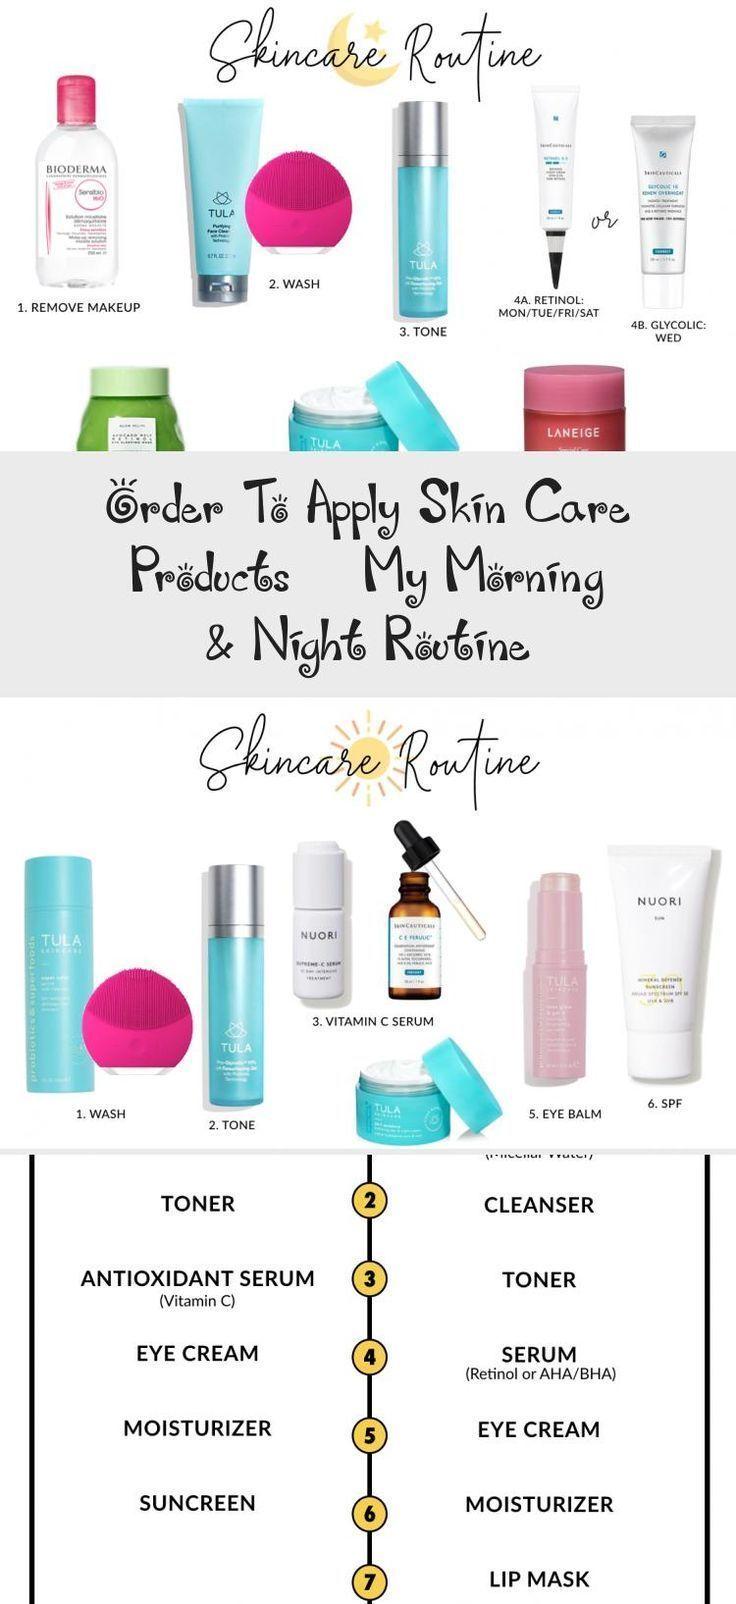 Skin Care Products Logo Skin Care Care Logo Products Skin Care Carecare Logo Products Skin In 2020 Skin Care Affordable Skin Care Skincare Logo